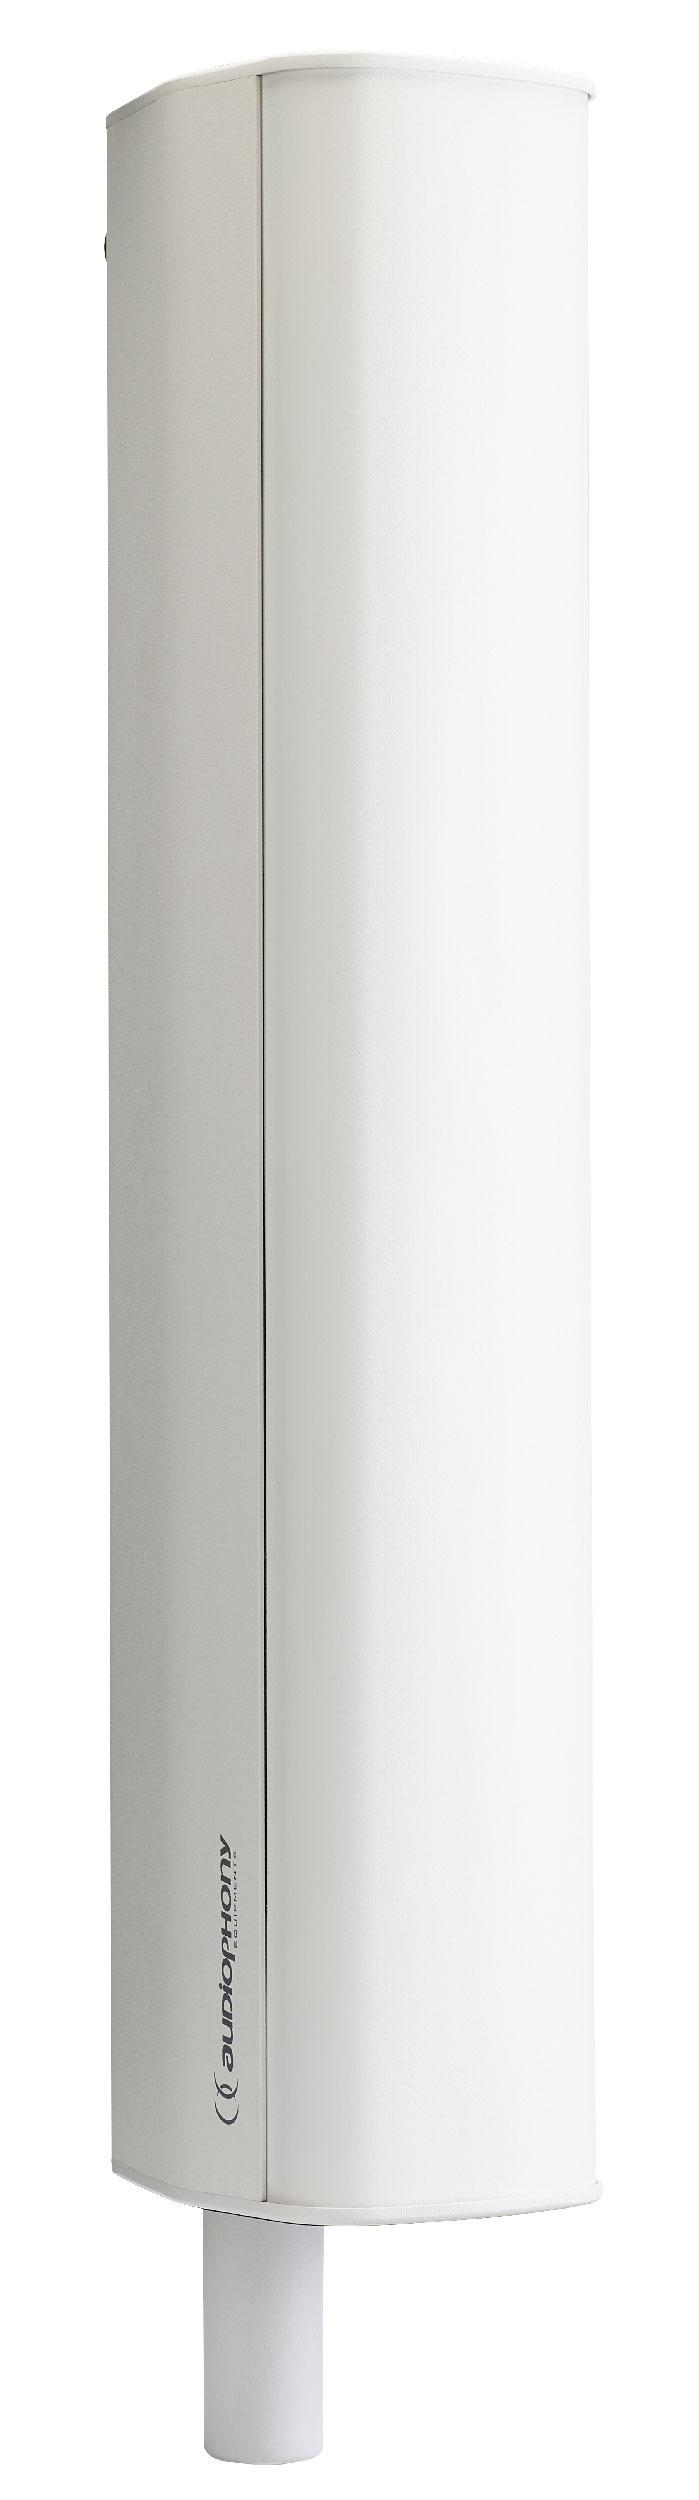 60cm ground support for iLINE83B